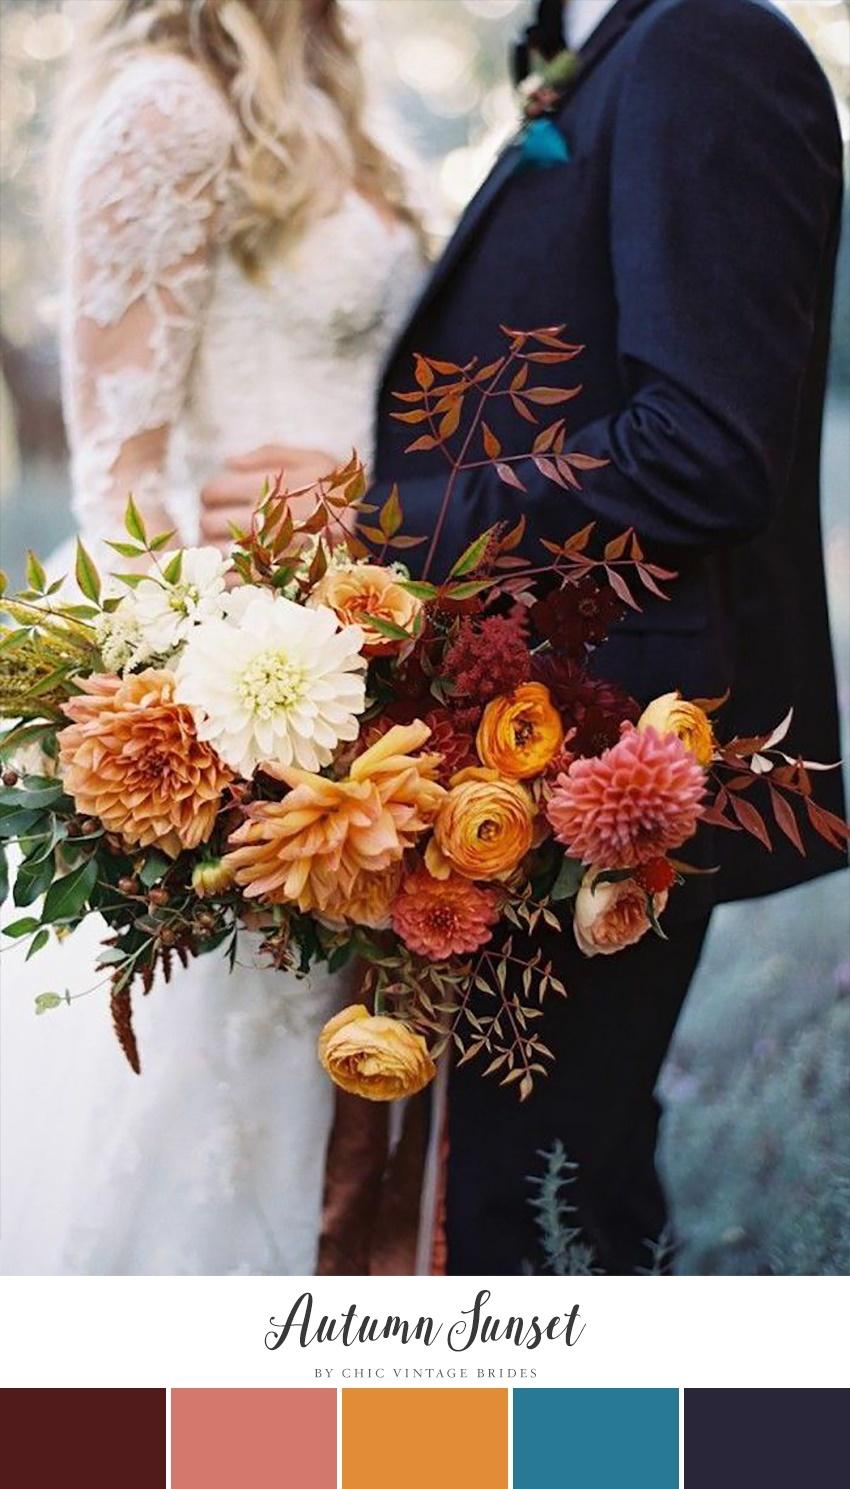 10 Stunning Autumn Wedding Colour Palettes - Chic Vintage ...